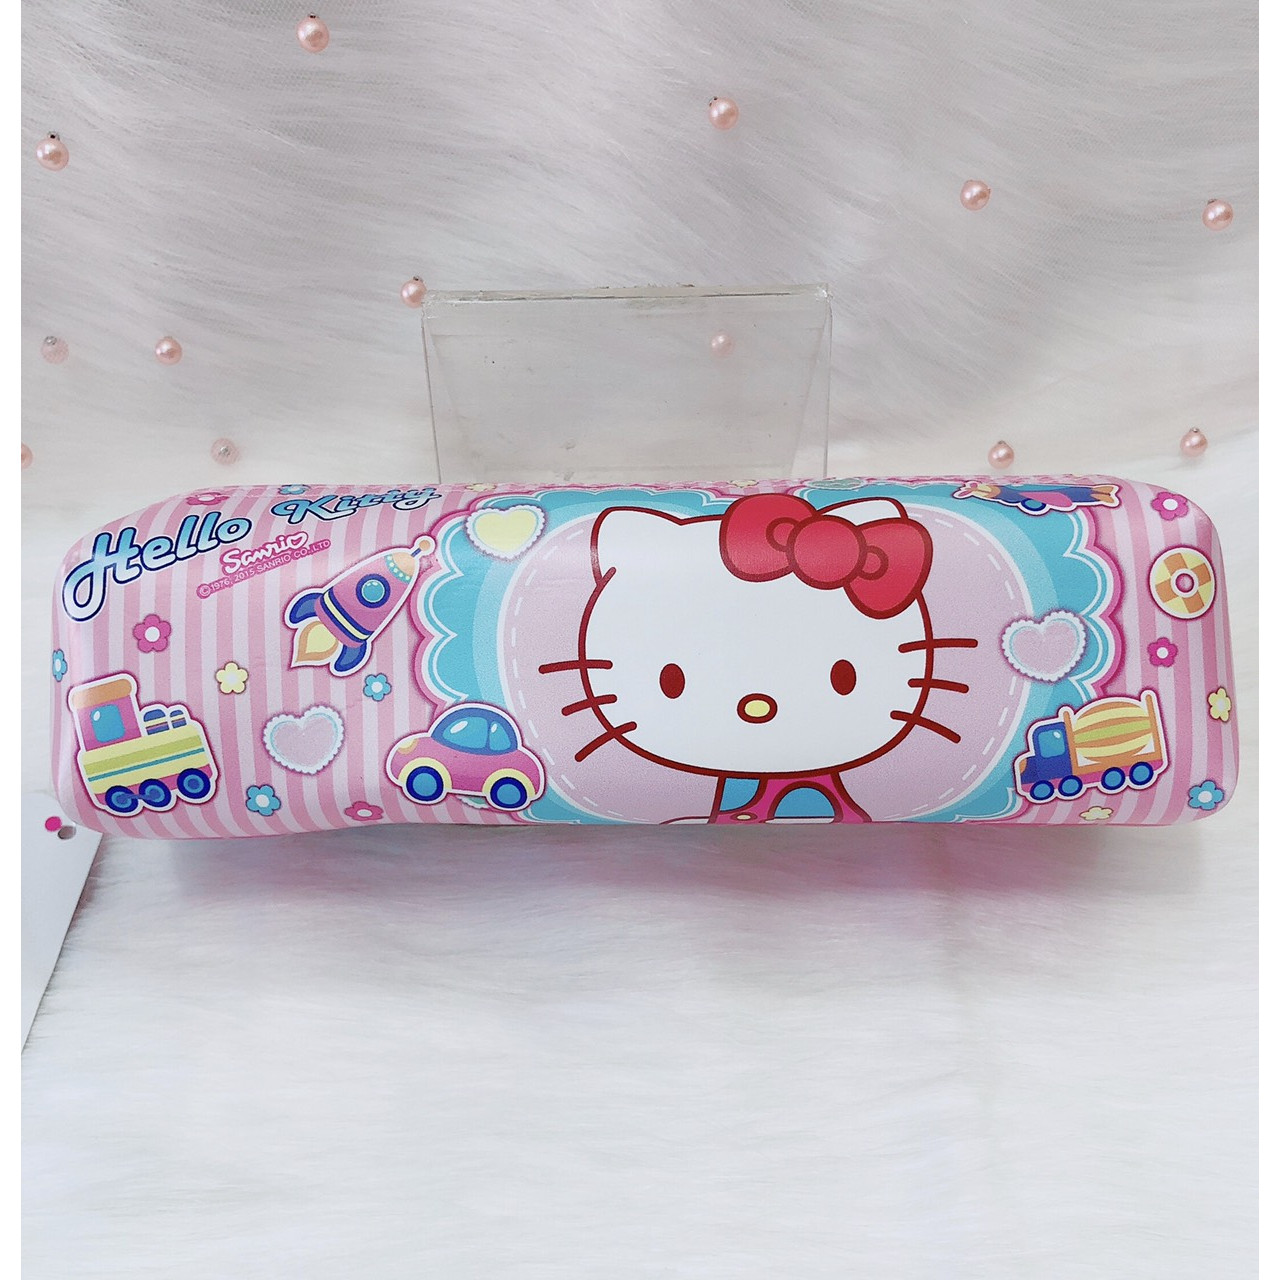 Bóp viết Hello Kitty (KT007VT01)